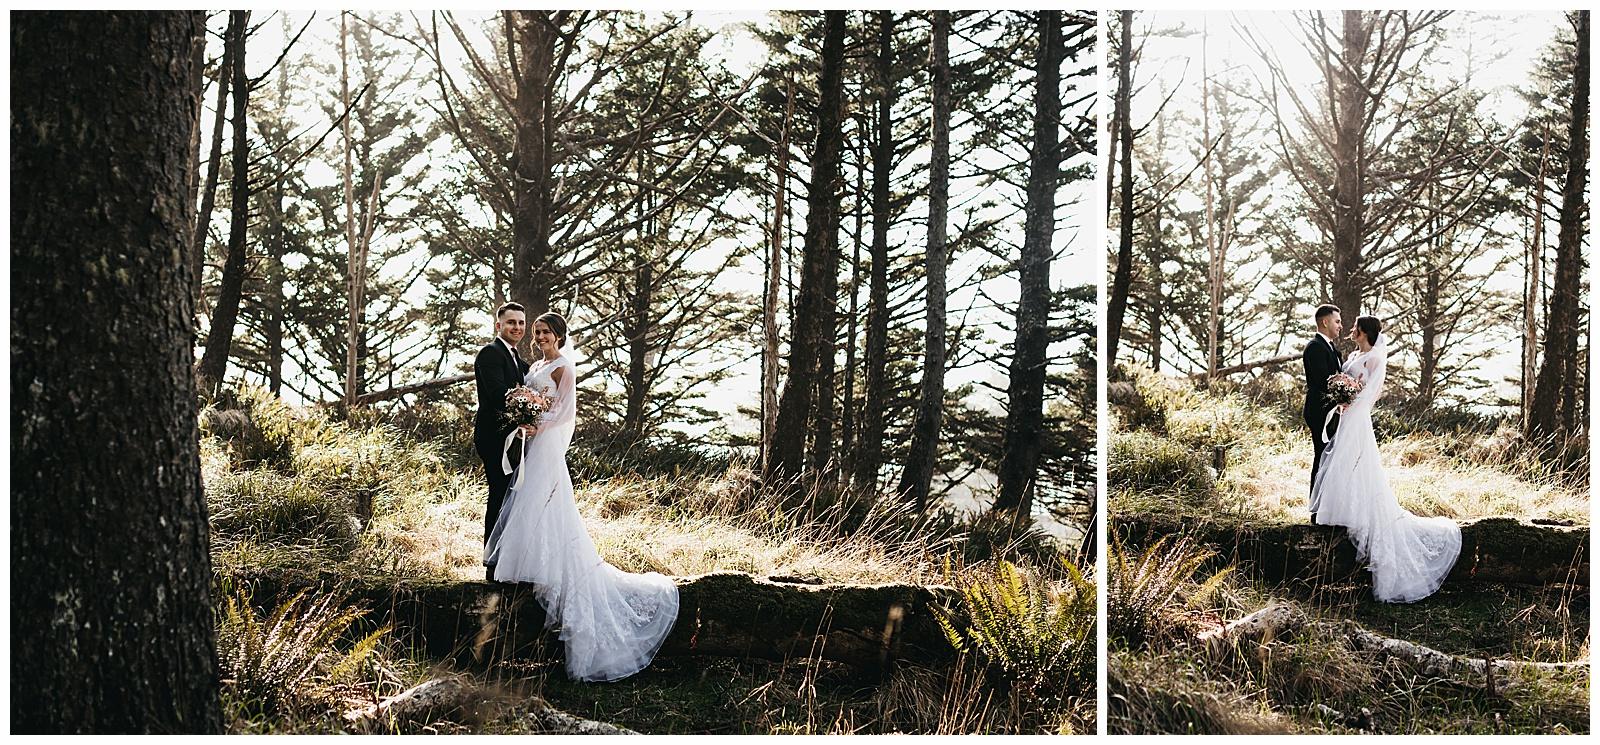 Ecola State Park Elopement Oregon Wedding Photographer Annie Zav Photography_0471.jpg